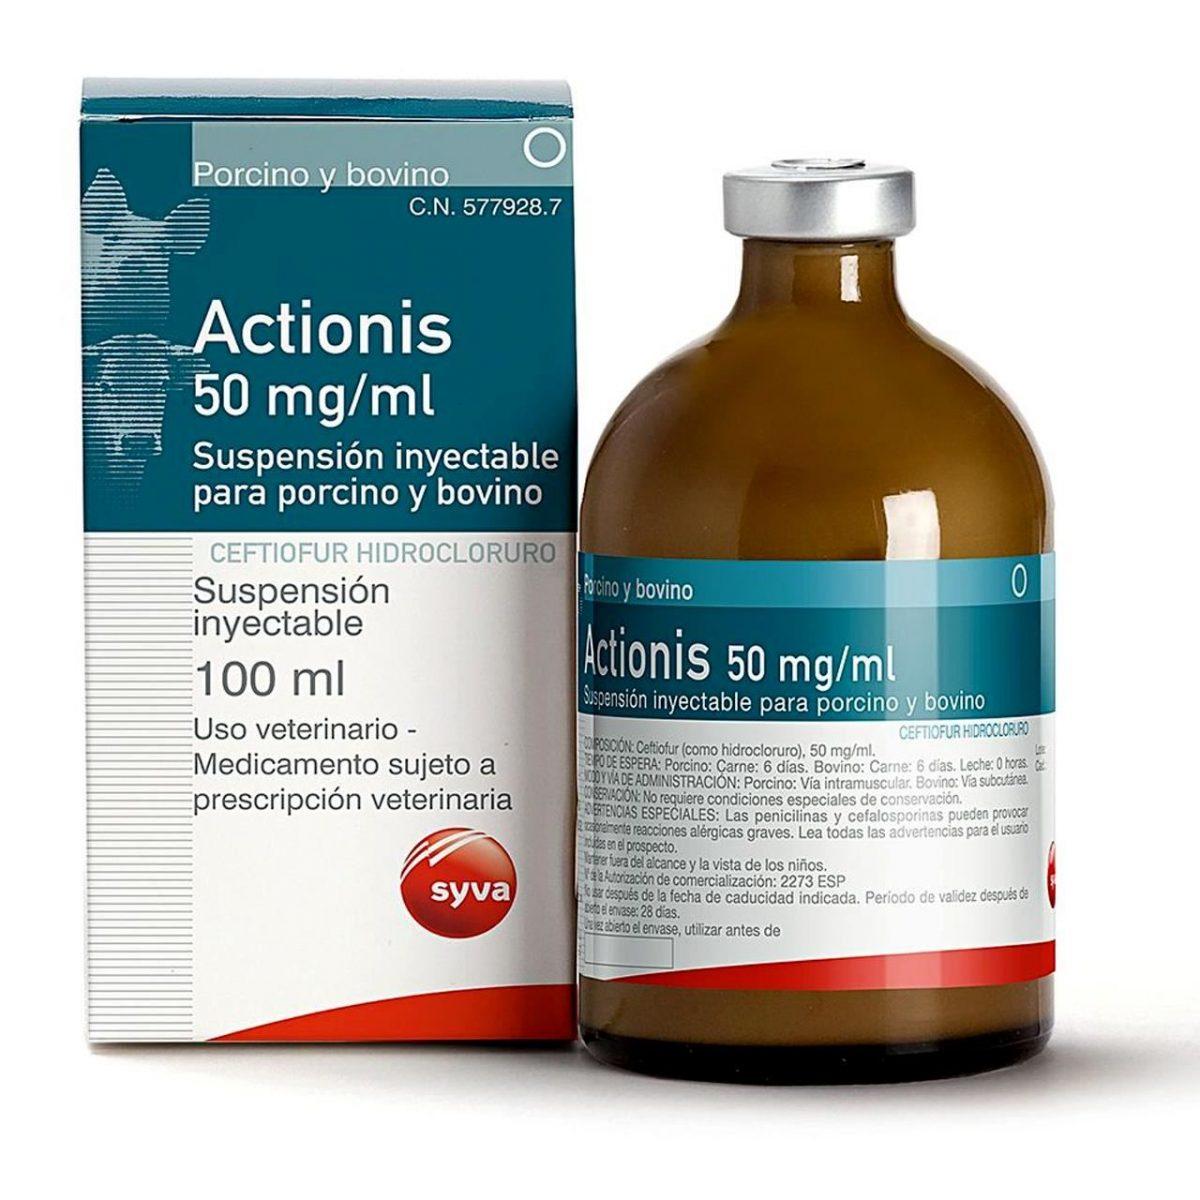 ACTIONIS 100 ML(ceftiofur)